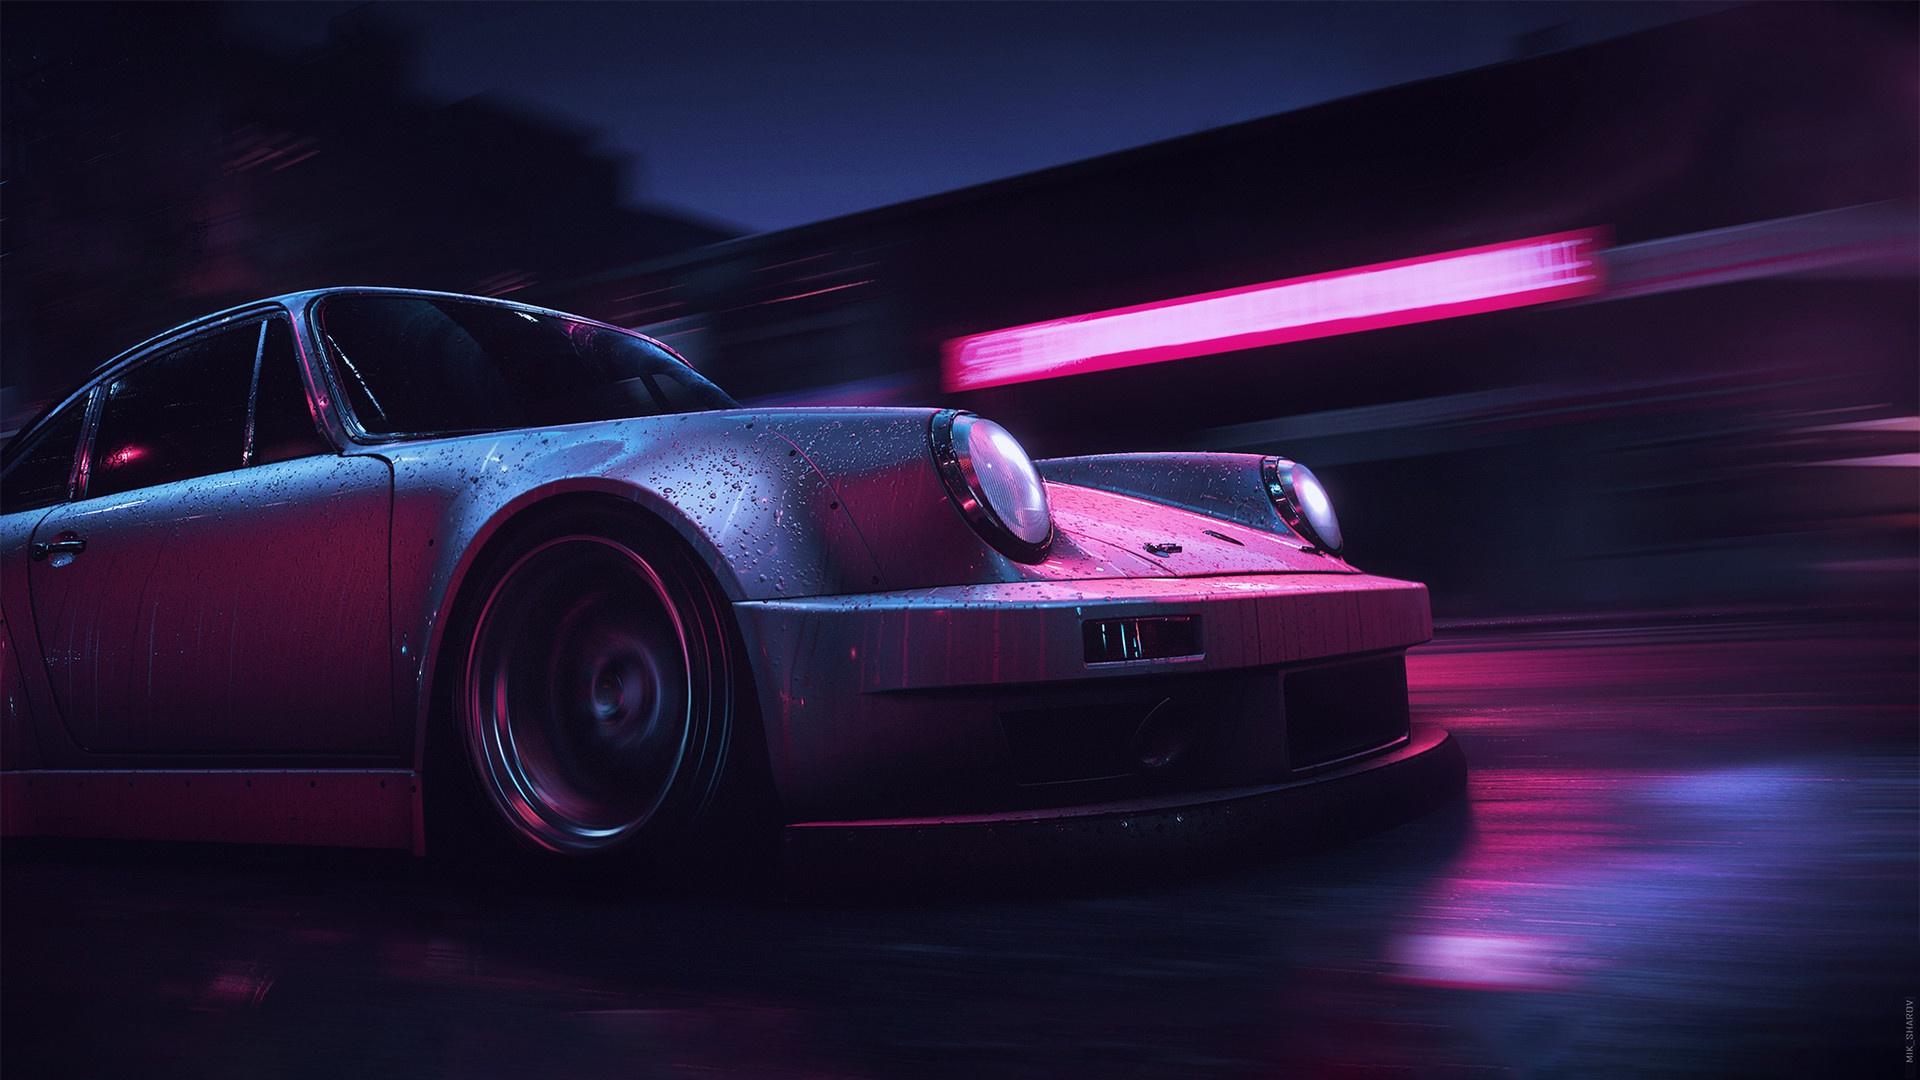 Wallpaper  vehicle, digital art, car, Porsche 911 Carrera